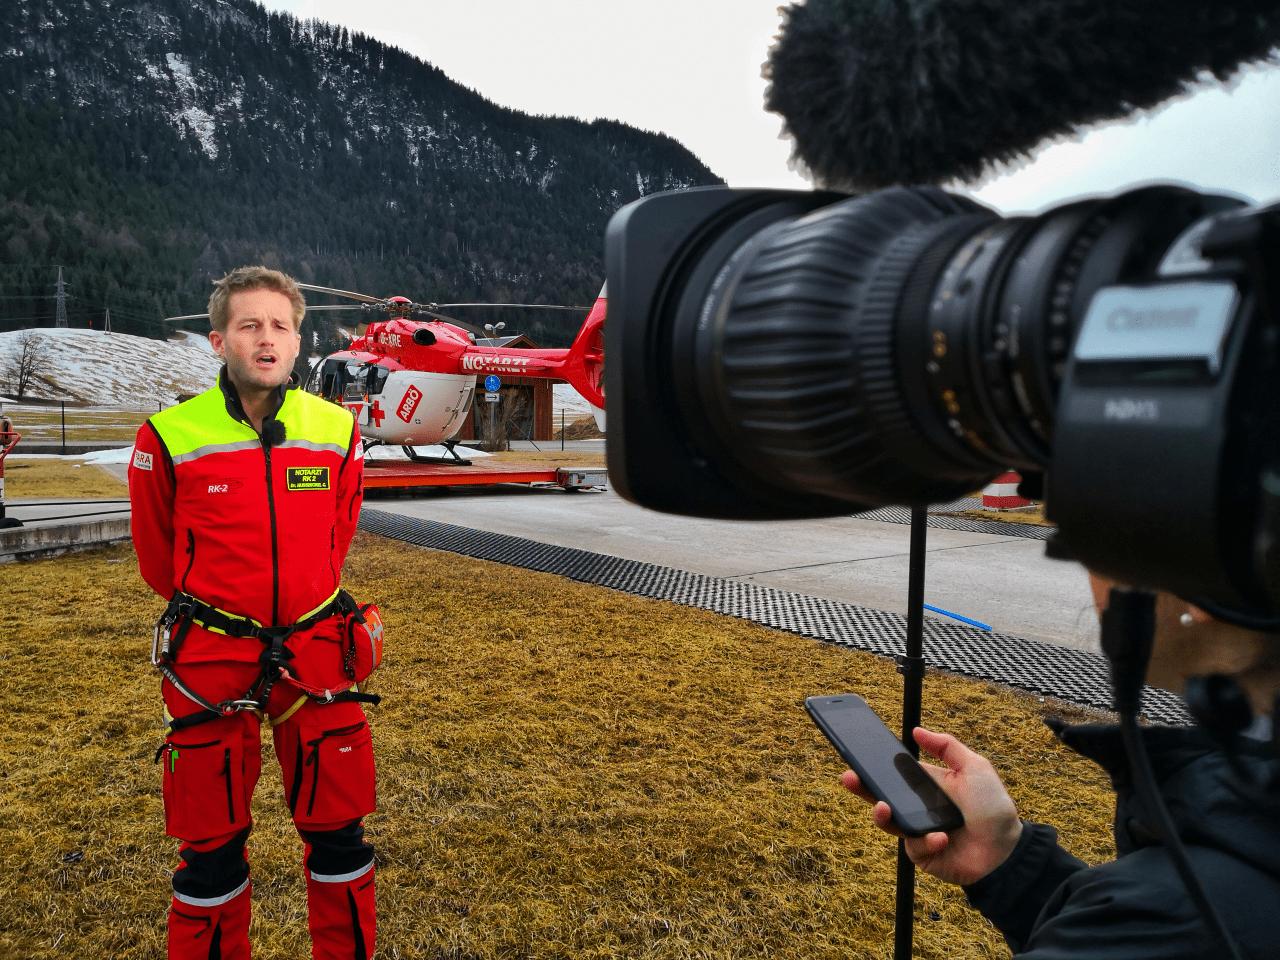 andreas felder kameramann dreharbeiten ara flugrettung reutte rk2 05 0220 - ServusTv - Notarzthubschrauber